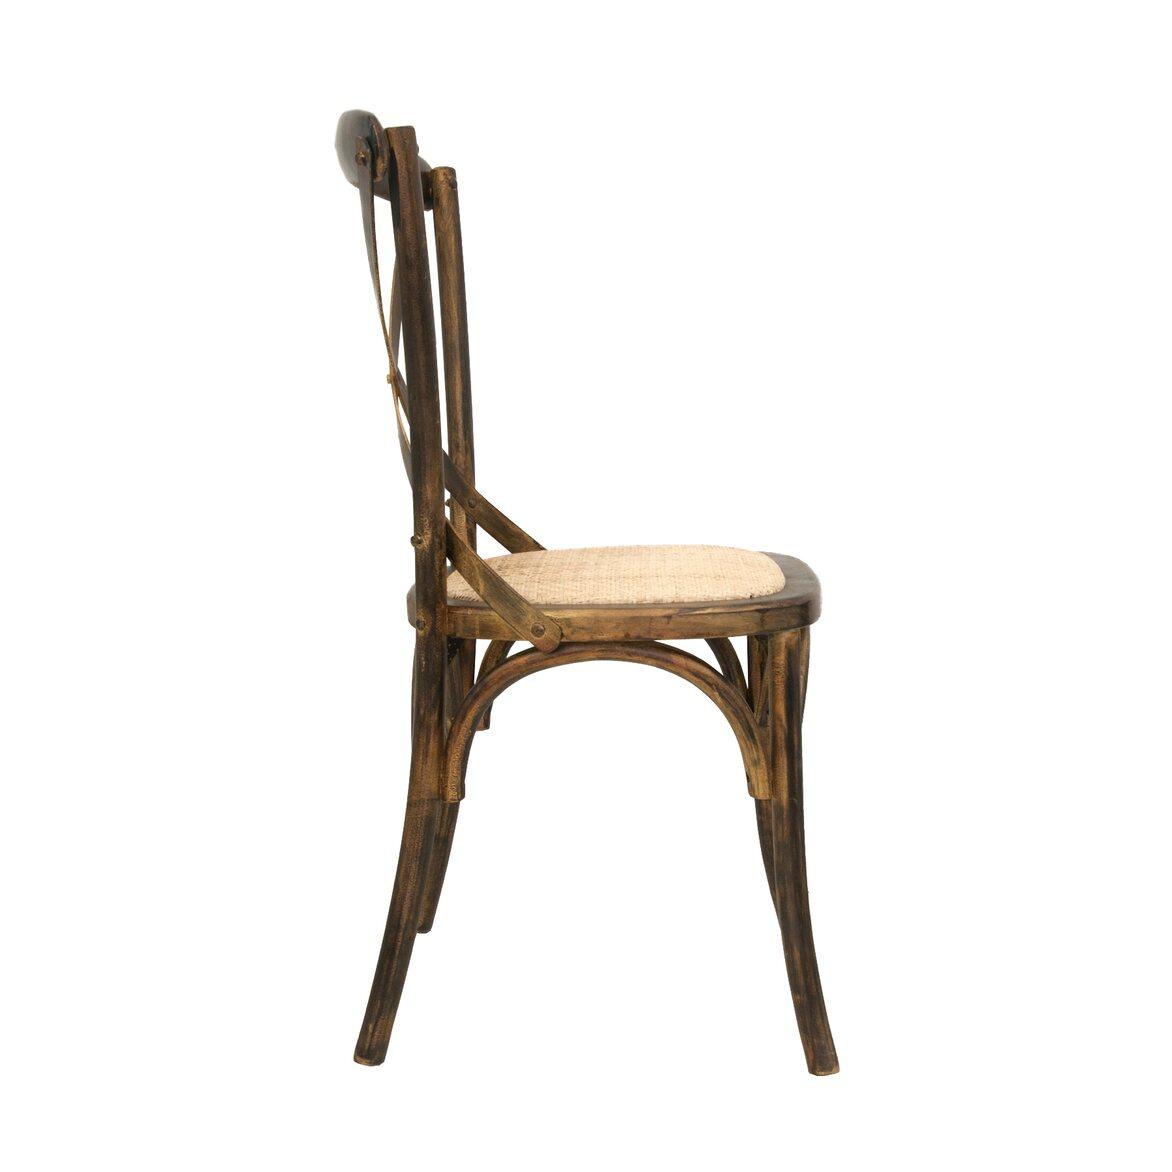 Стул Cross back bronze 2 | Обеденные стулья Kingsby